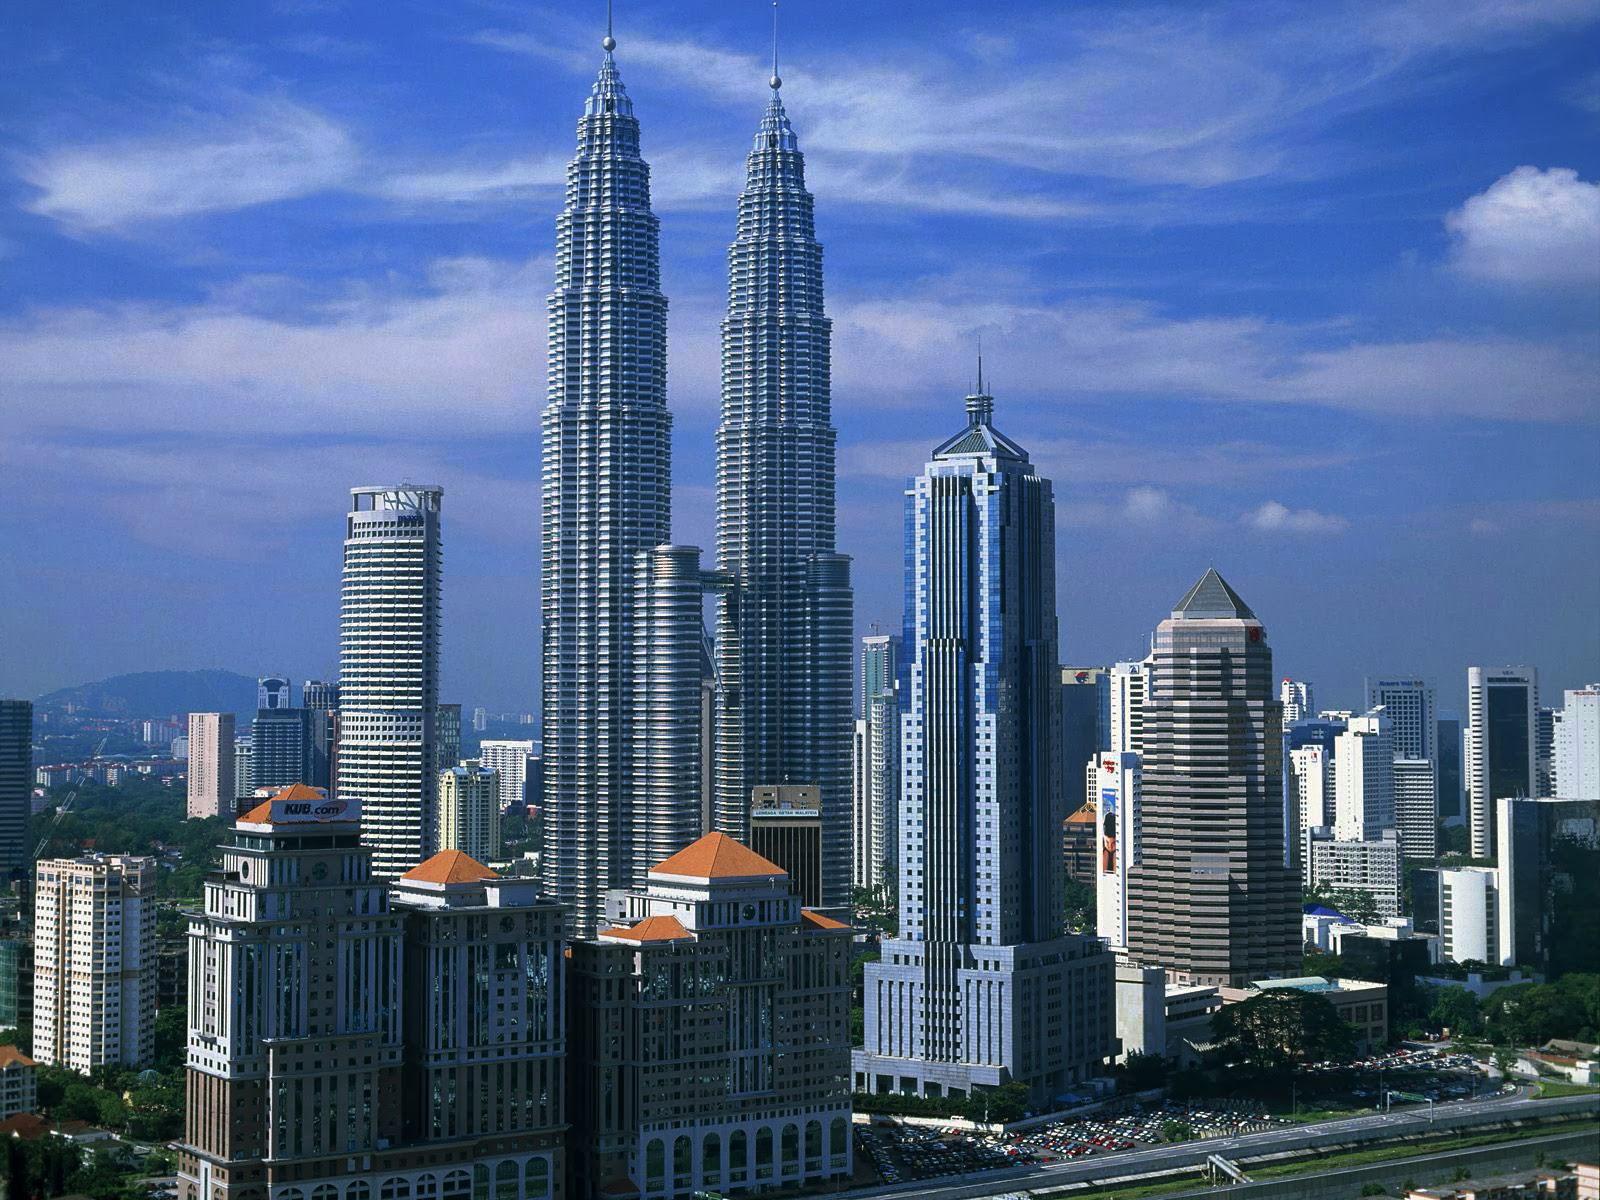 Kuala Lumpur Beautiful Hd Wallpapers: Petronas Twin Towers Desktop Wallpapers View